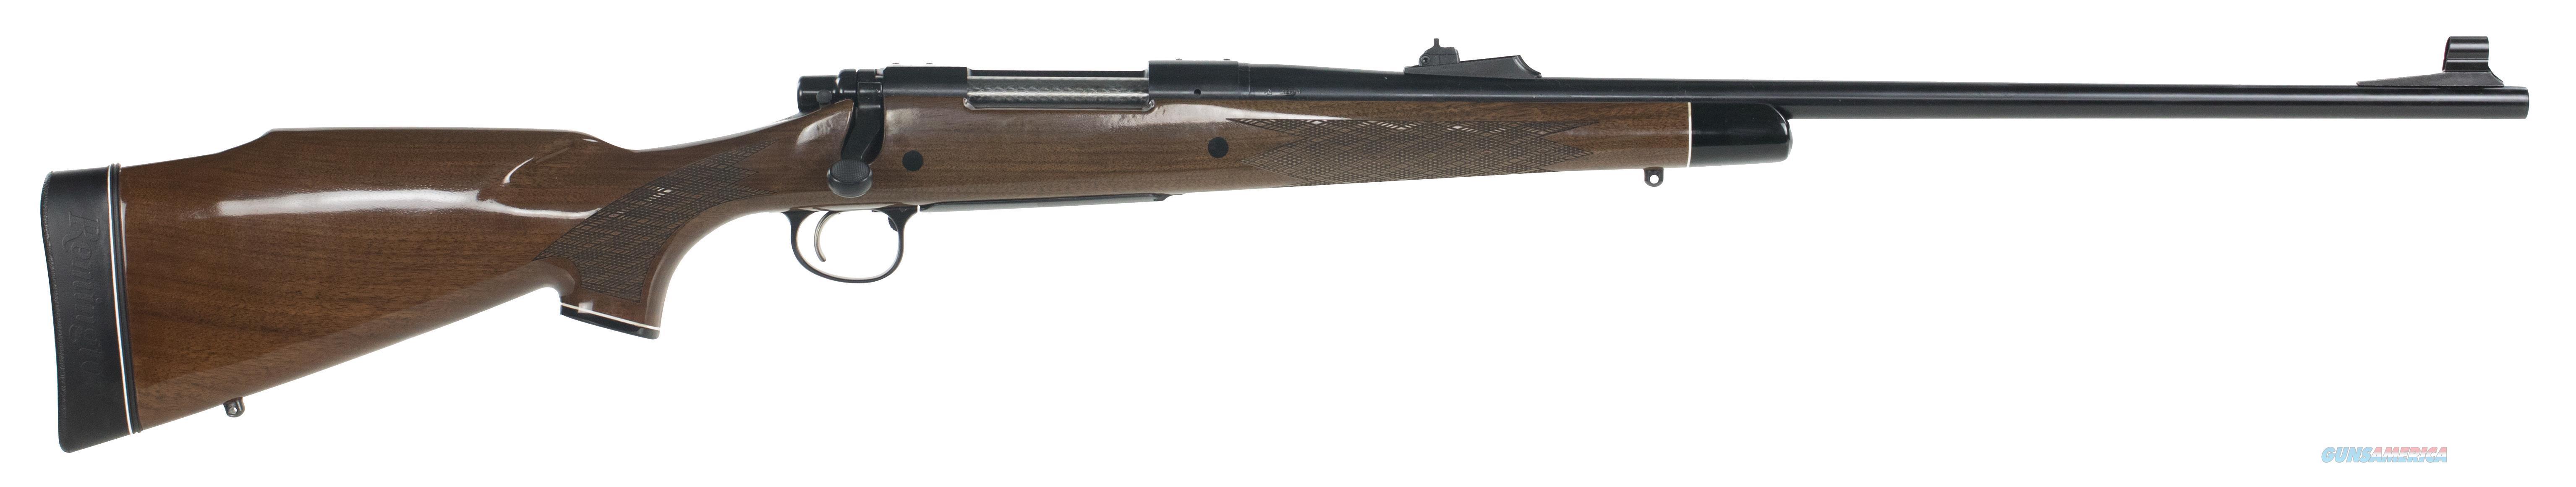 "Remington Firearms 25803 700 Bdl Bolt 7Mm Rem Mag 24"" 3+1 American Walnut Stk Blued 25803  Guns > Rifles > R Misc Rifles"